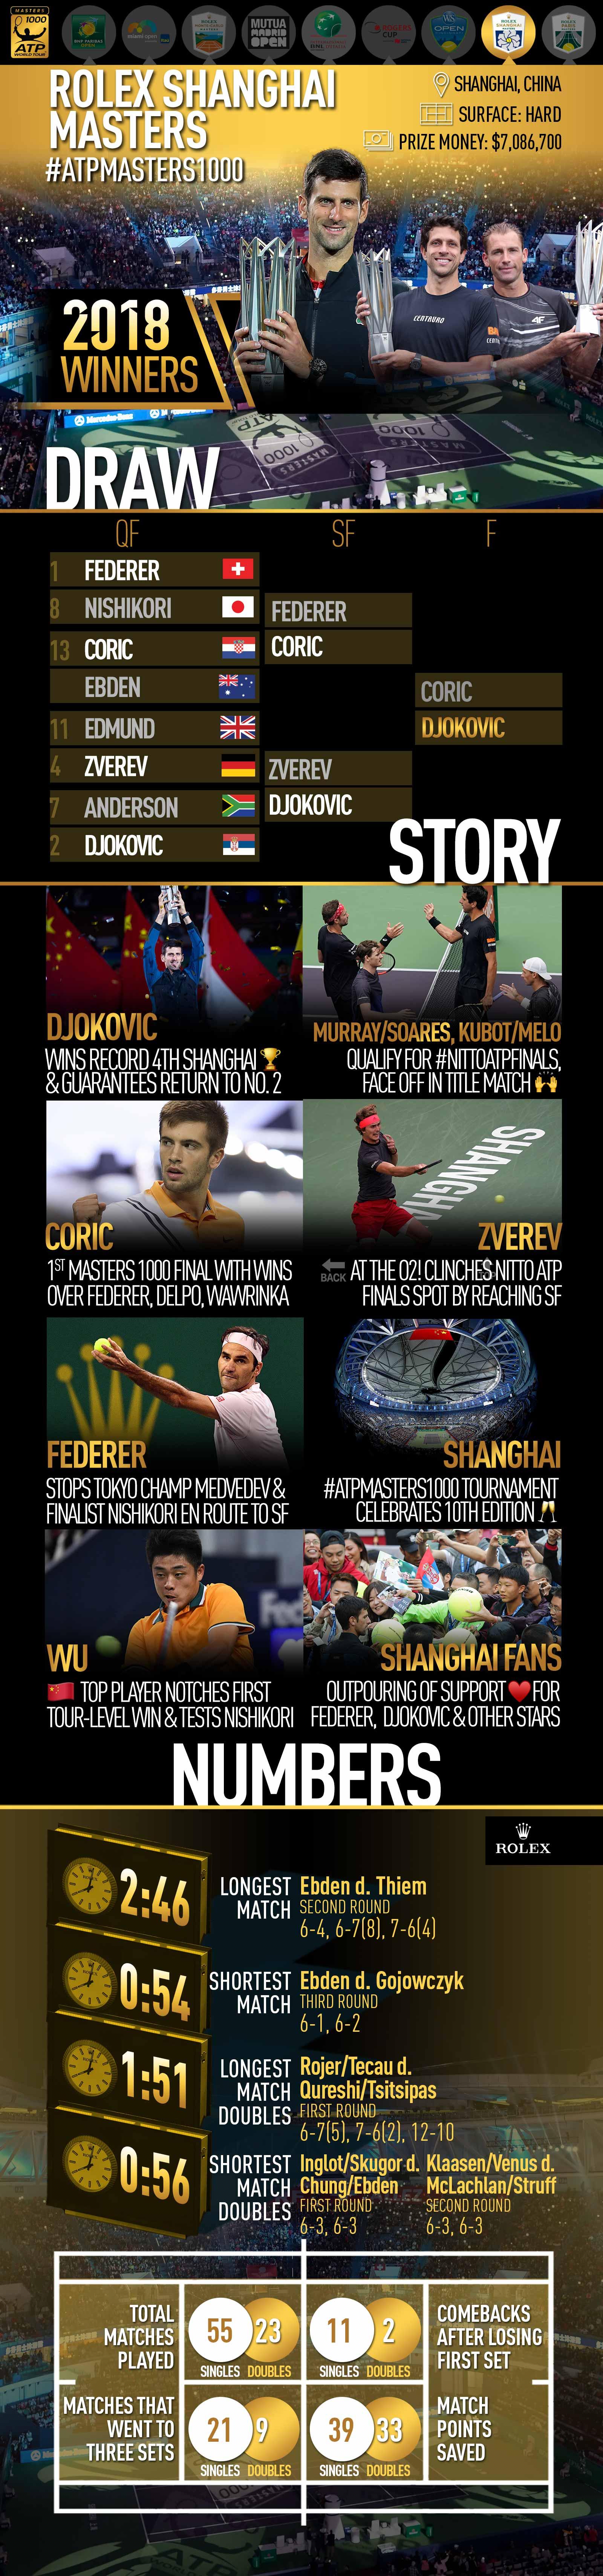 <a href='https://www.atpworldtour.com/en/tournaments/shanghai/5014/overview'>Rolex Shanghai Masters</a>